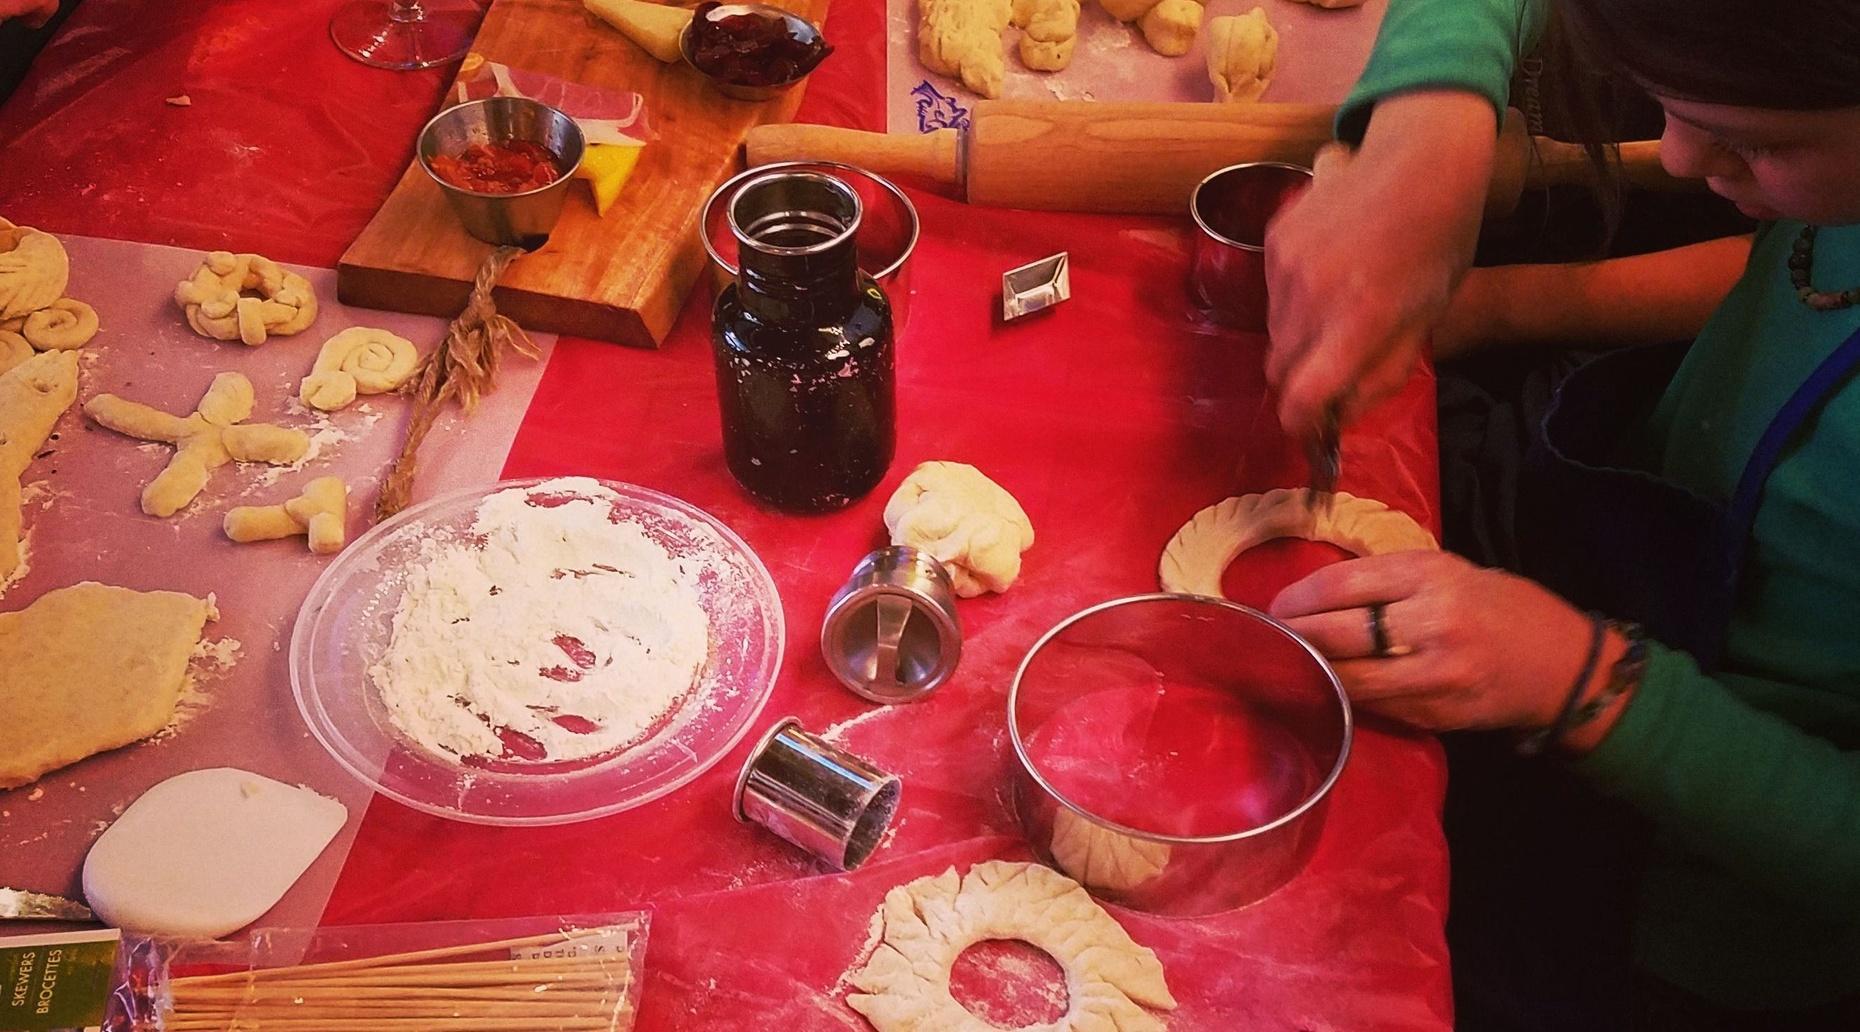 St. Joseph's Day Bread Making Workshop